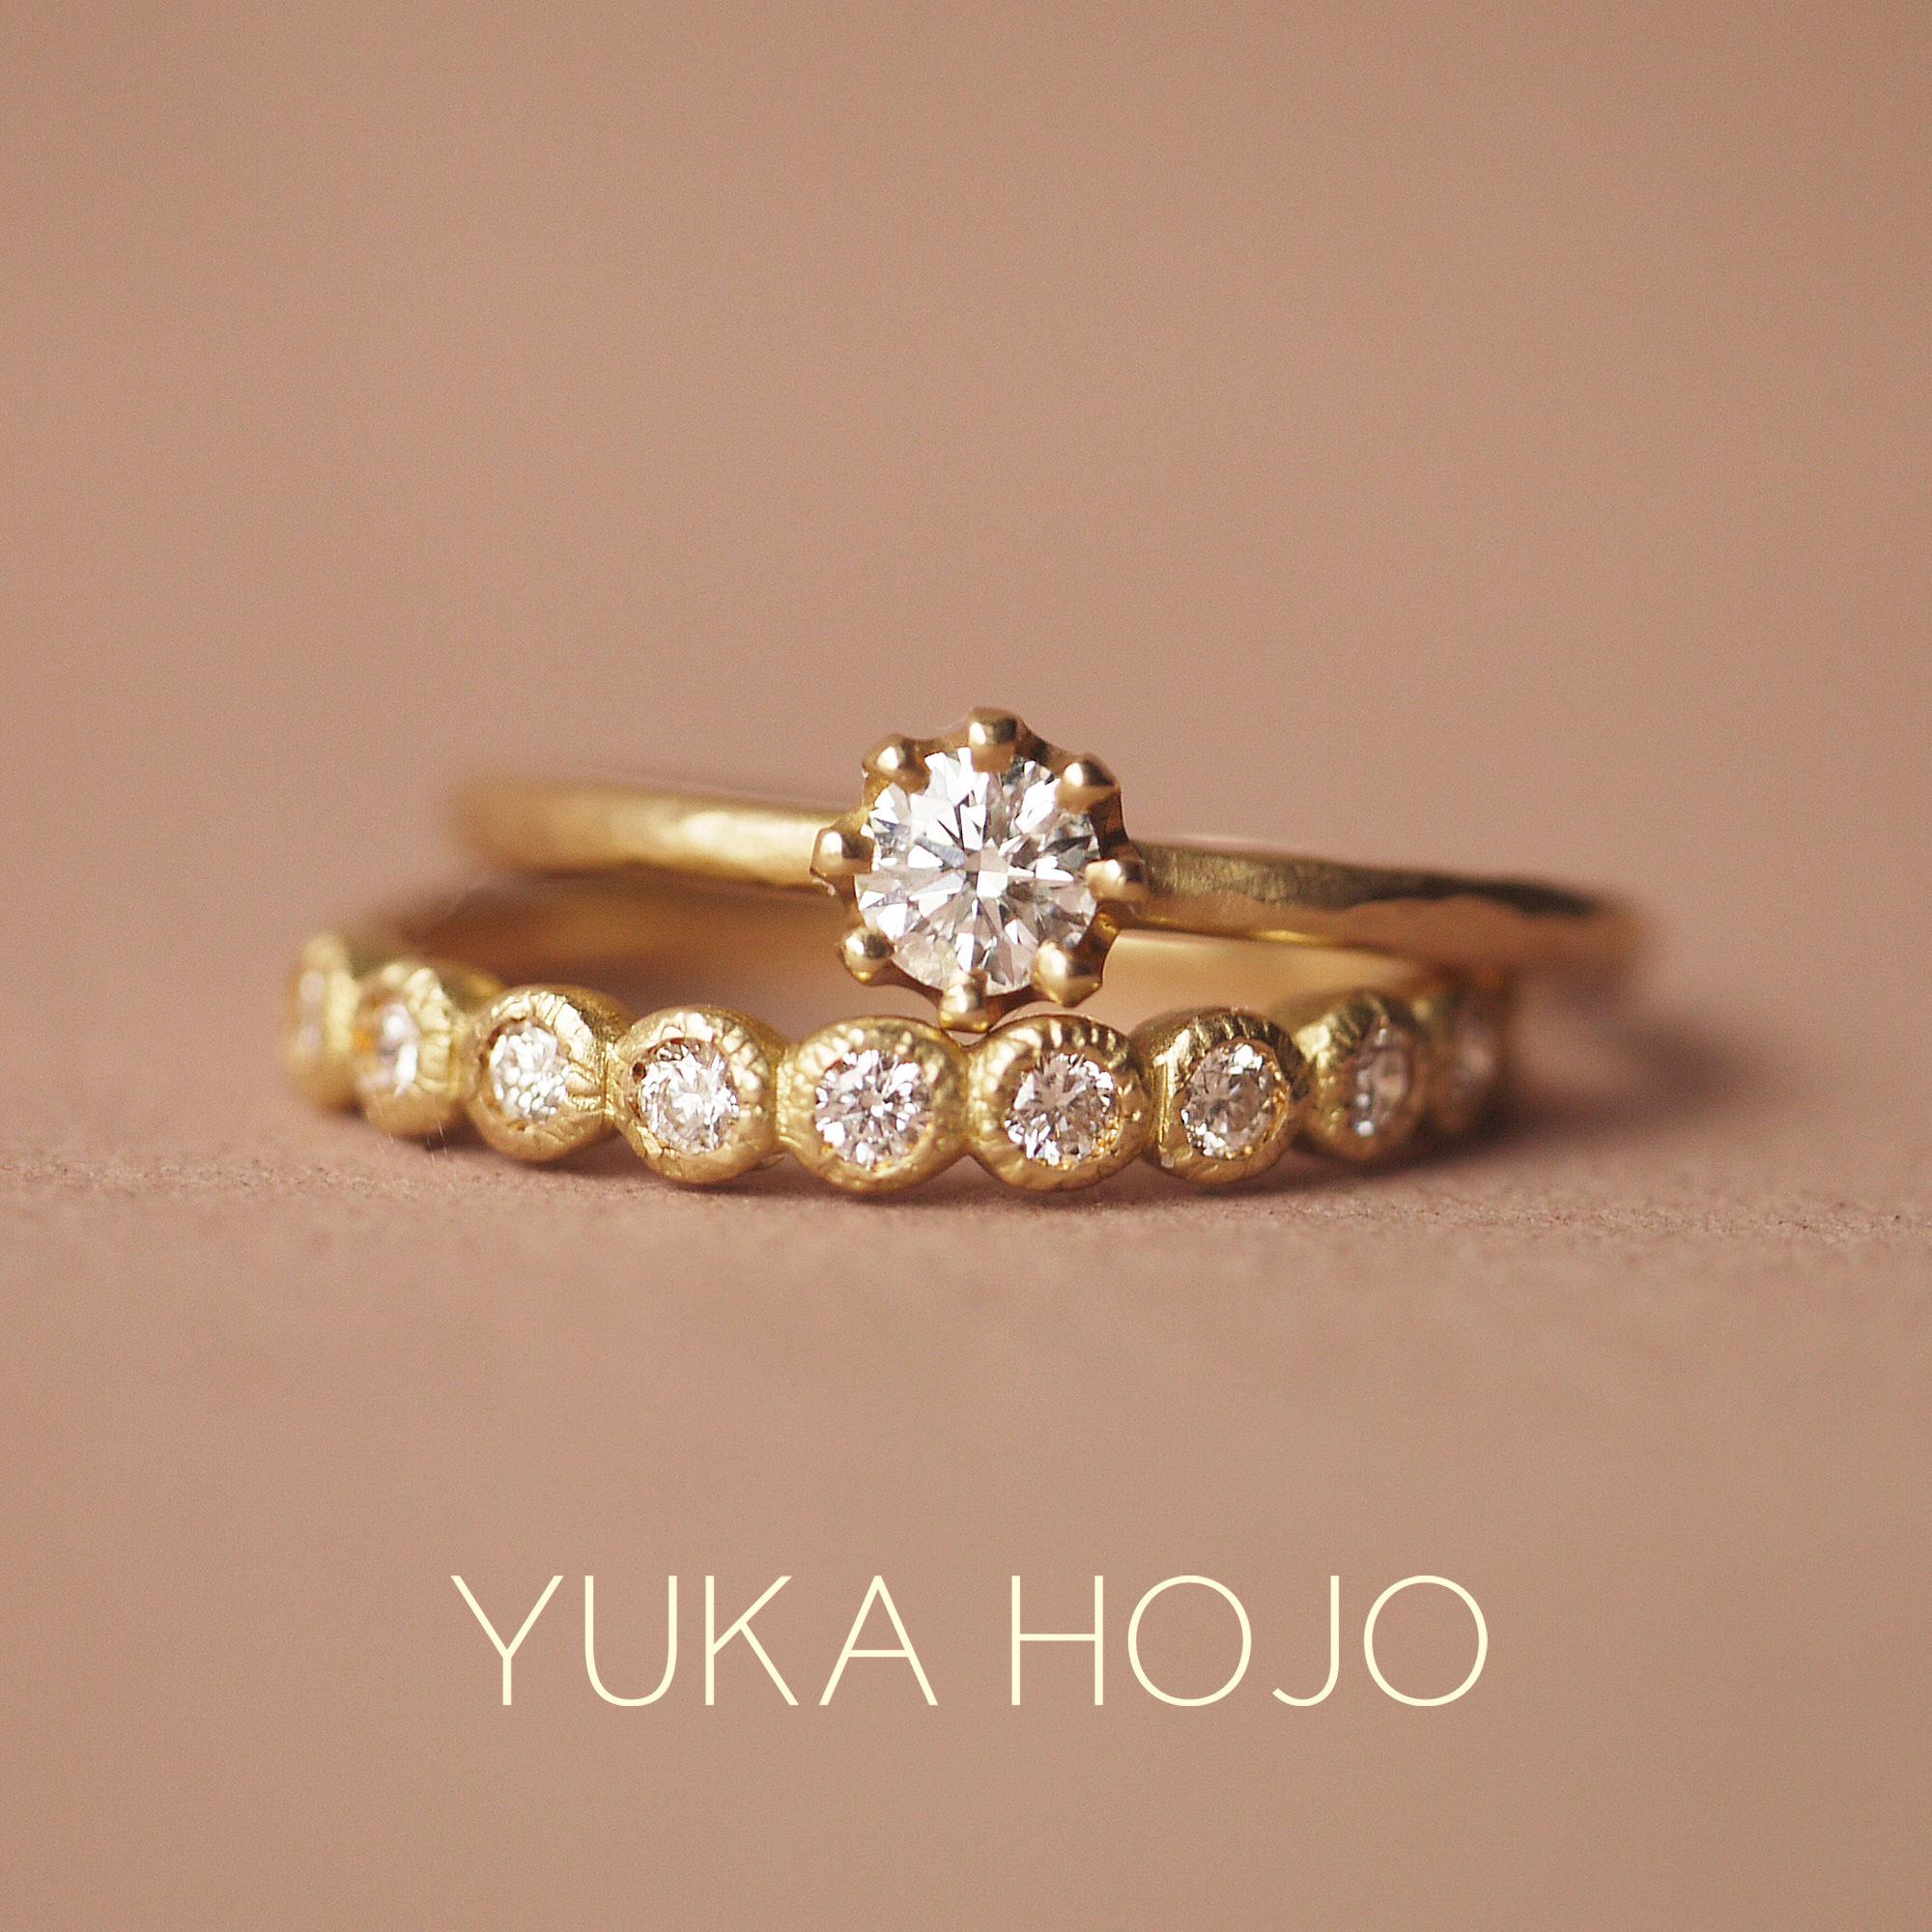 YUKAHOJOユカホウジョウの婚約指輪と結婚指輪